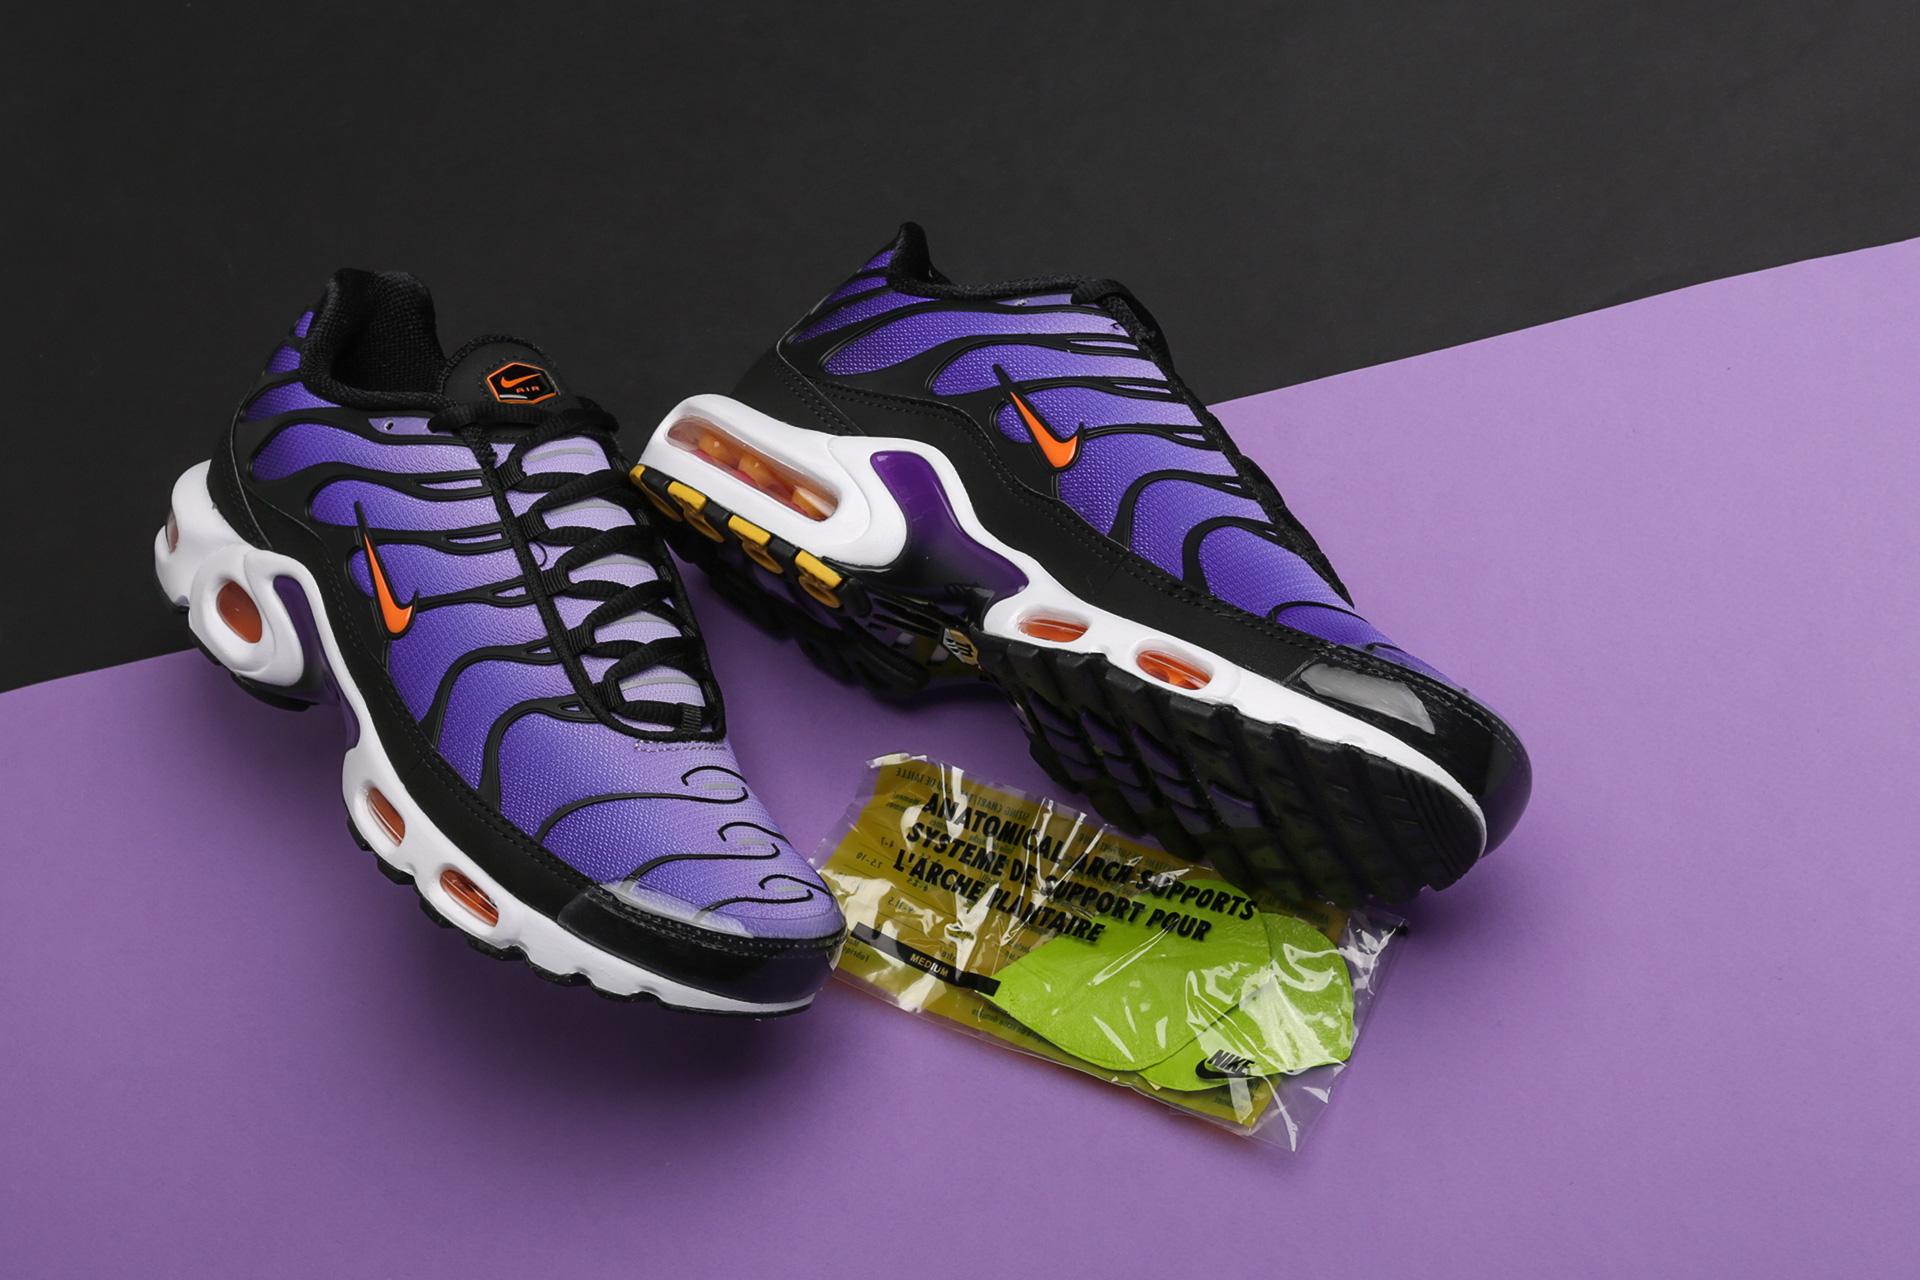 870b385429e53f ... Купить мужские фиолетовые кроссовки Nike Air Max Plus OG - фото 2  картинки ...